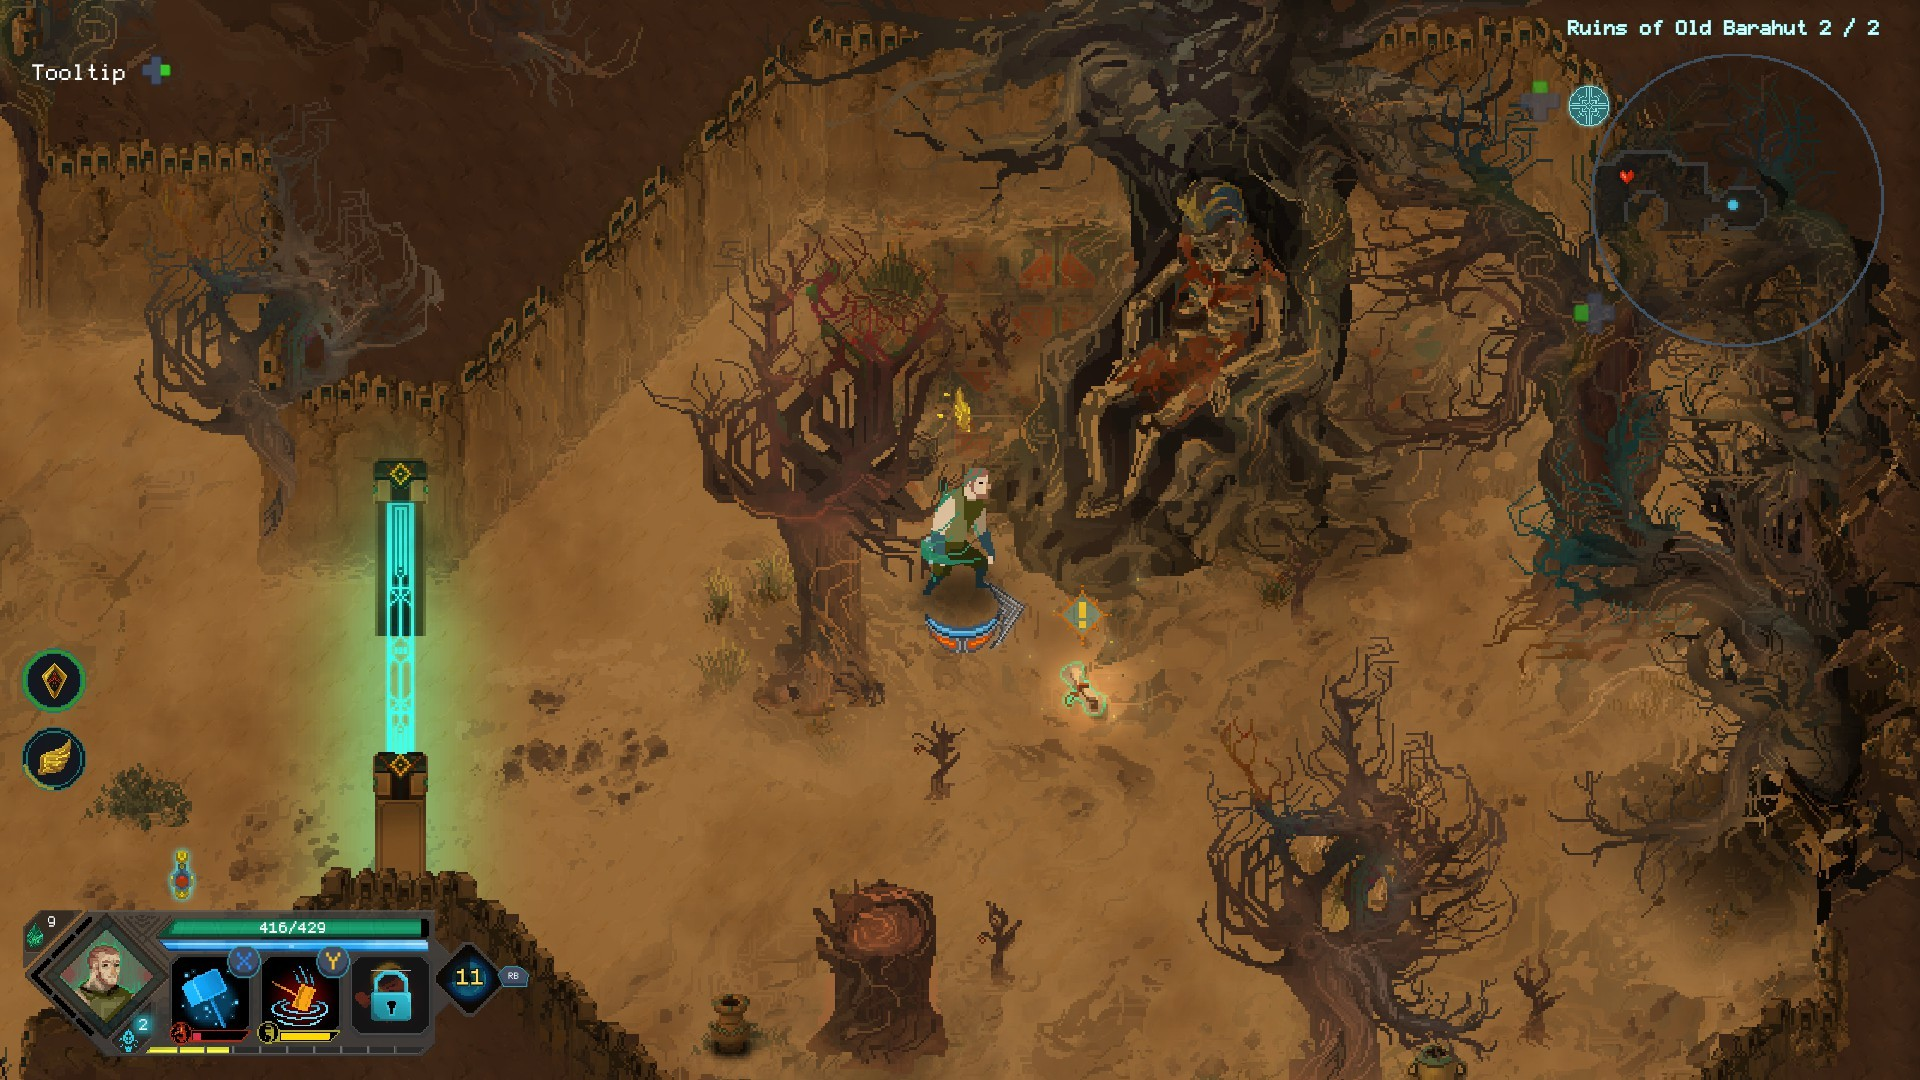 Children of Morta Screenshot 1